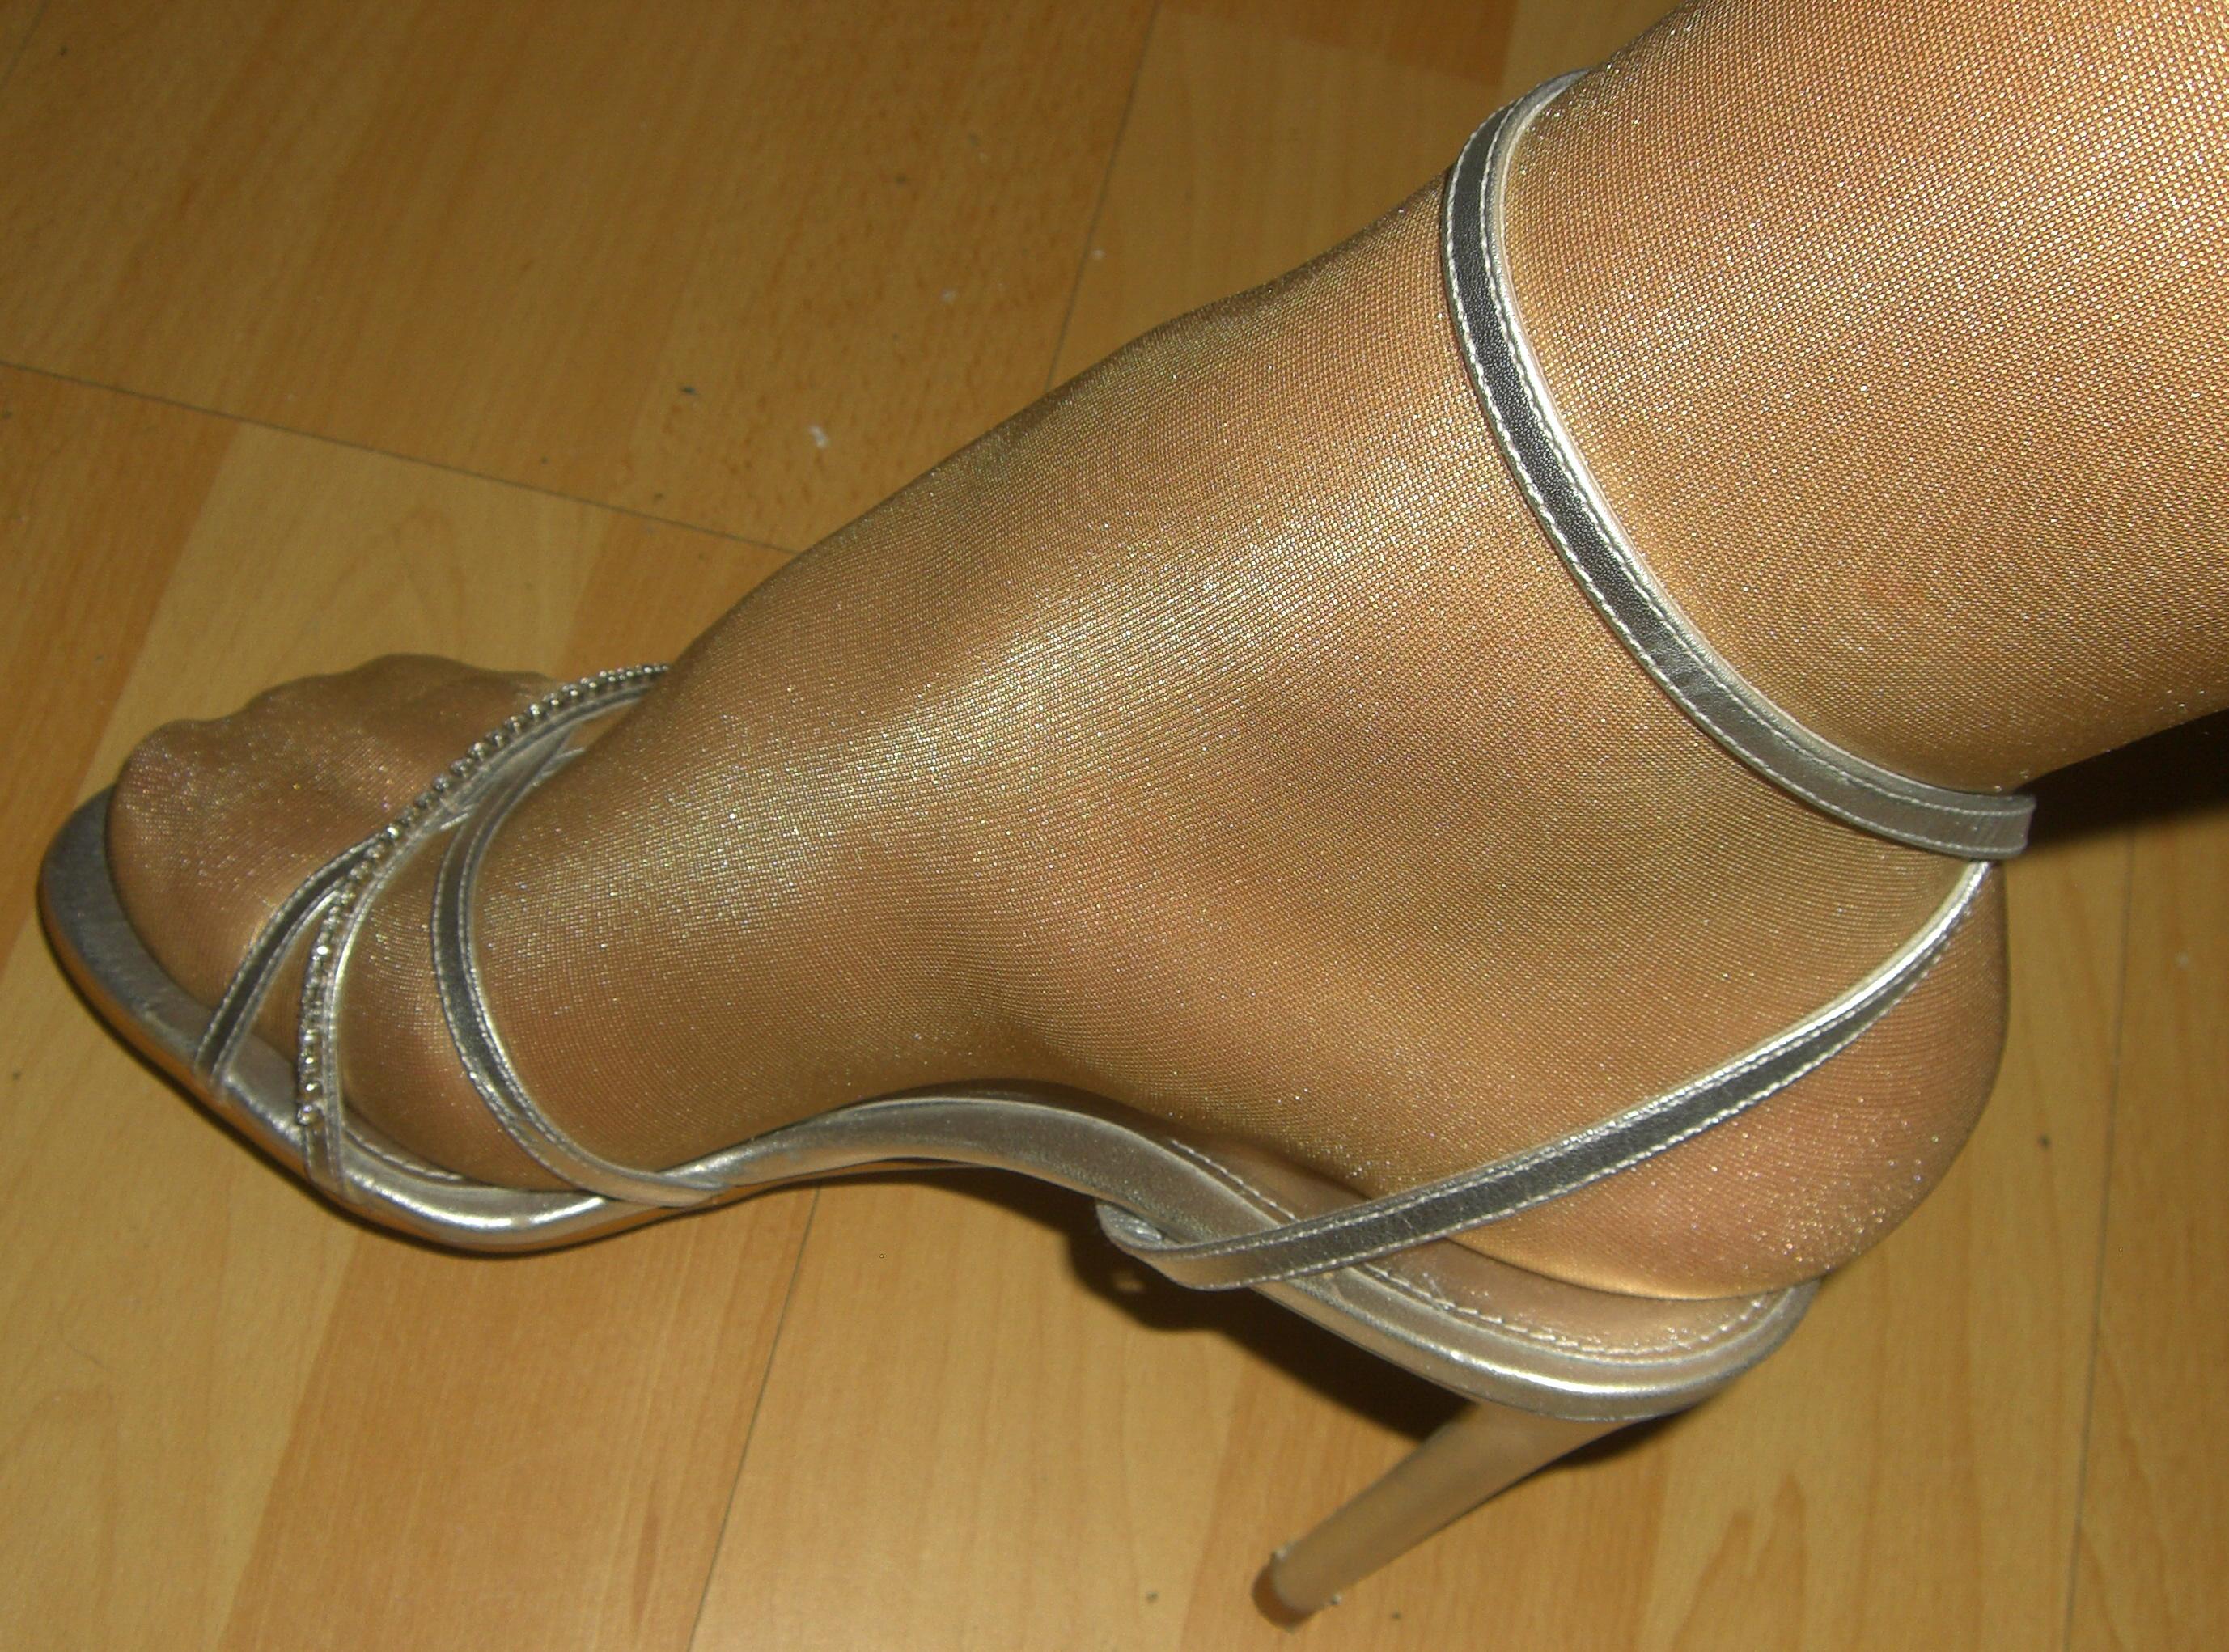 Босоножках ножки и в капроне